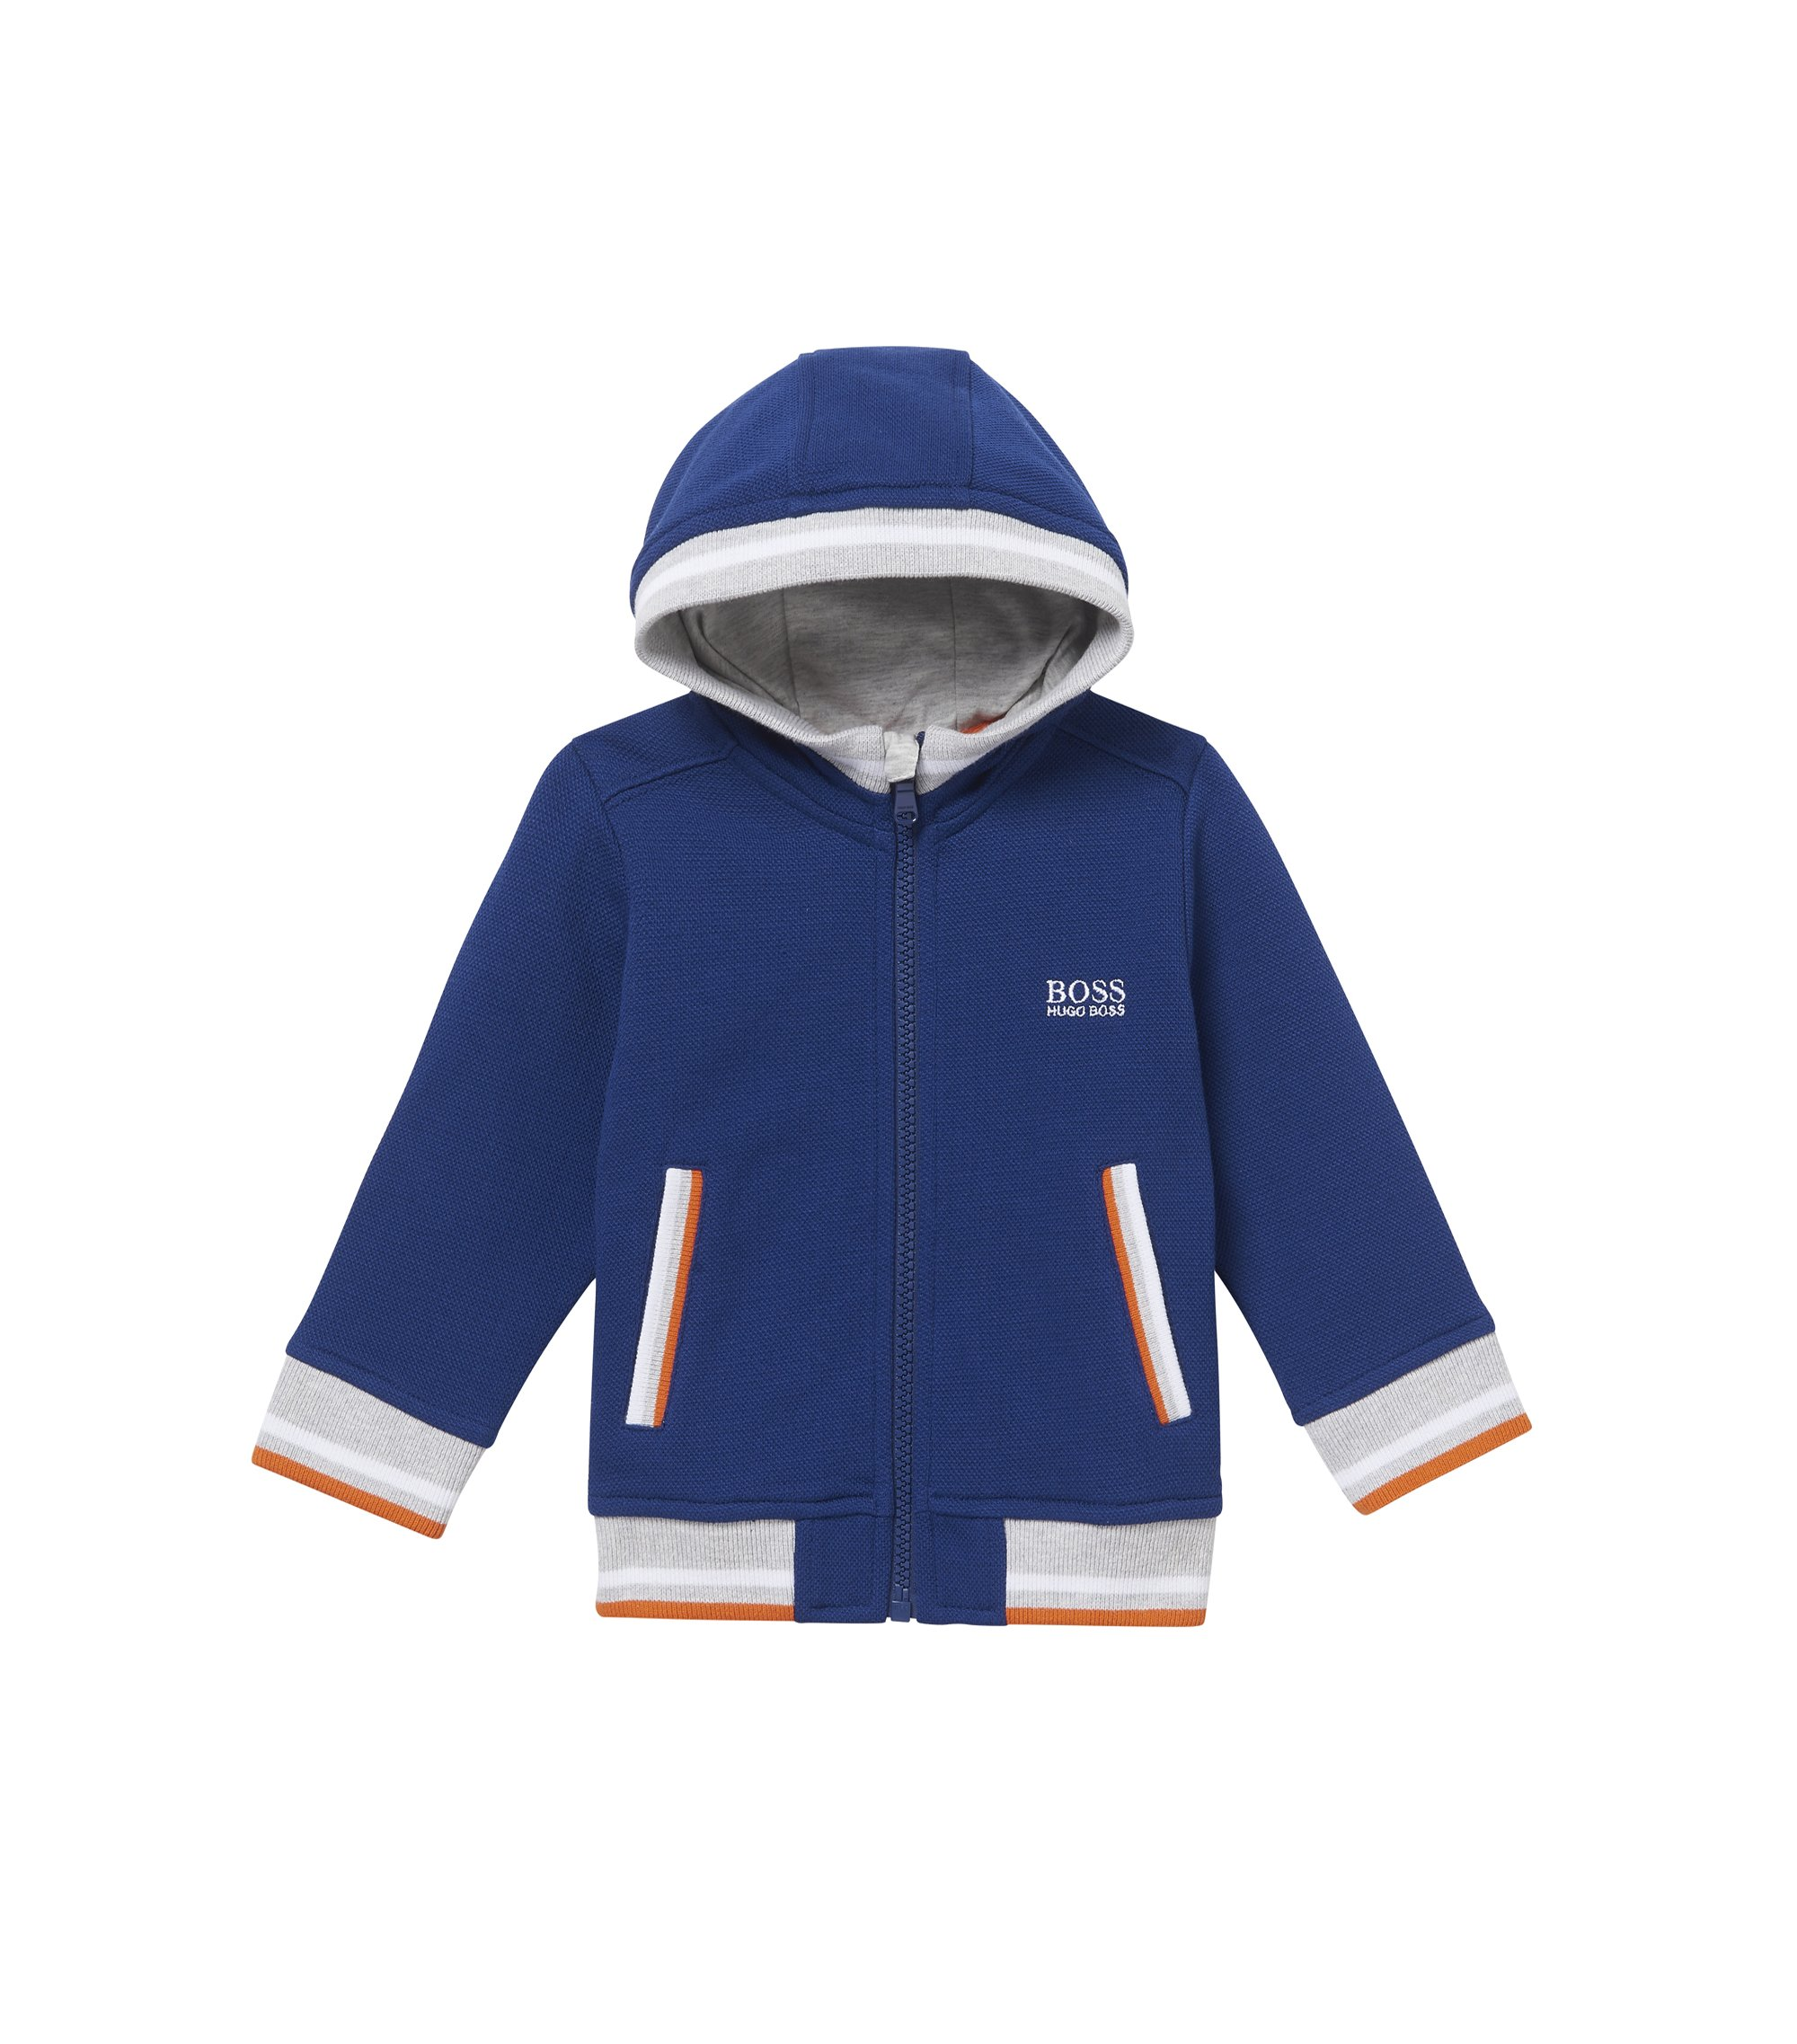 'J05521' | Toddler Stretch Cotton Blend Hood Sweat Jacket, Dark Blue